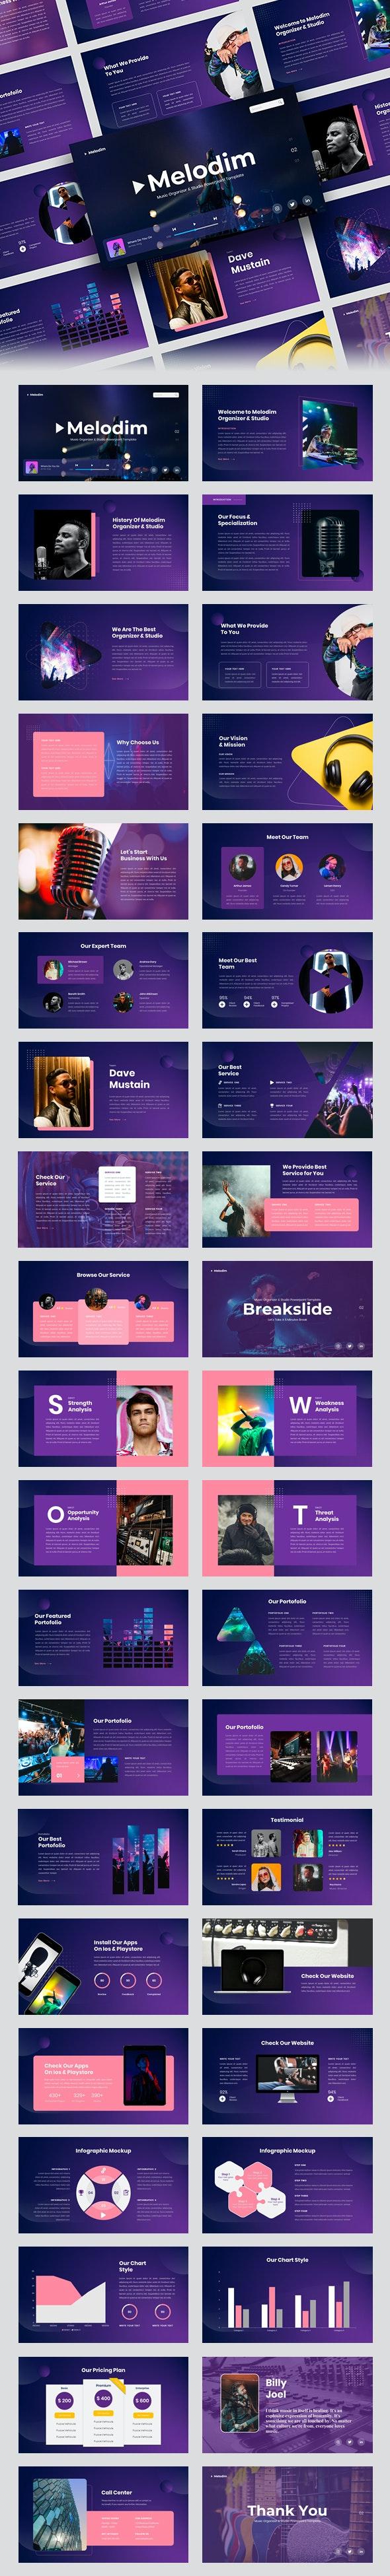 Melodim – Music Organizer & Studio PowerPoint Template - Creative PowerPoint Templates